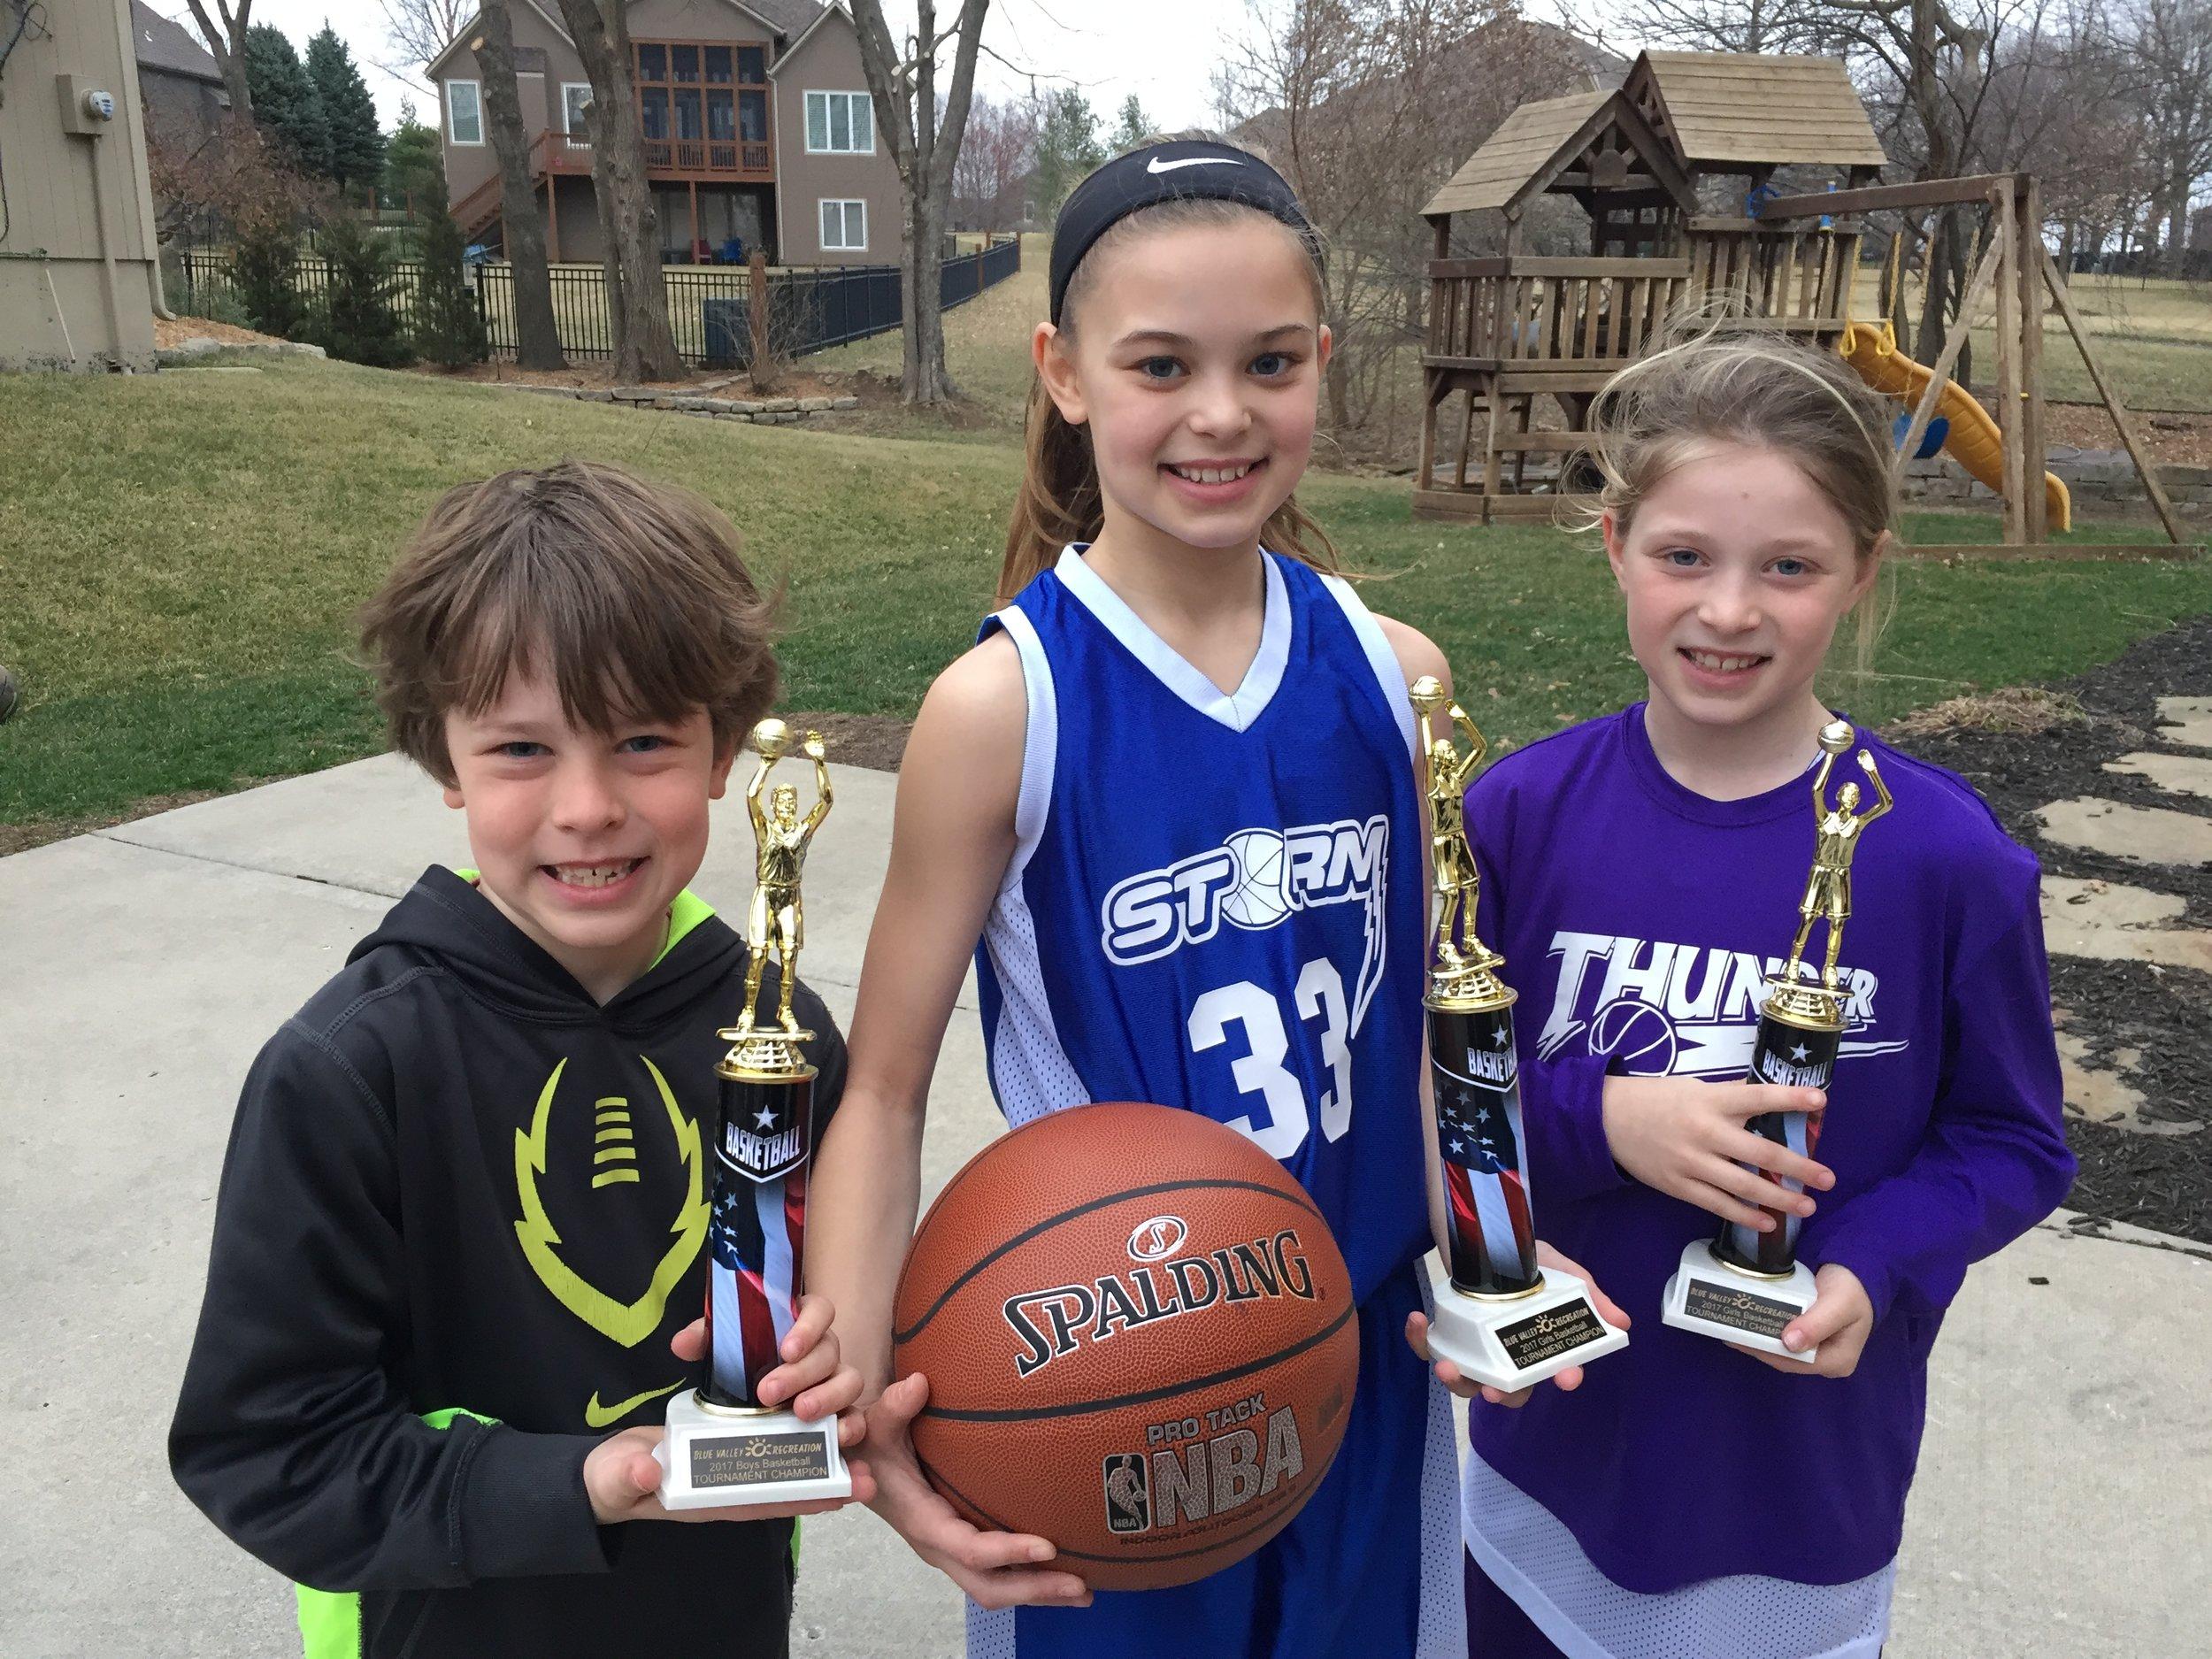 Kids with trophies.JPG